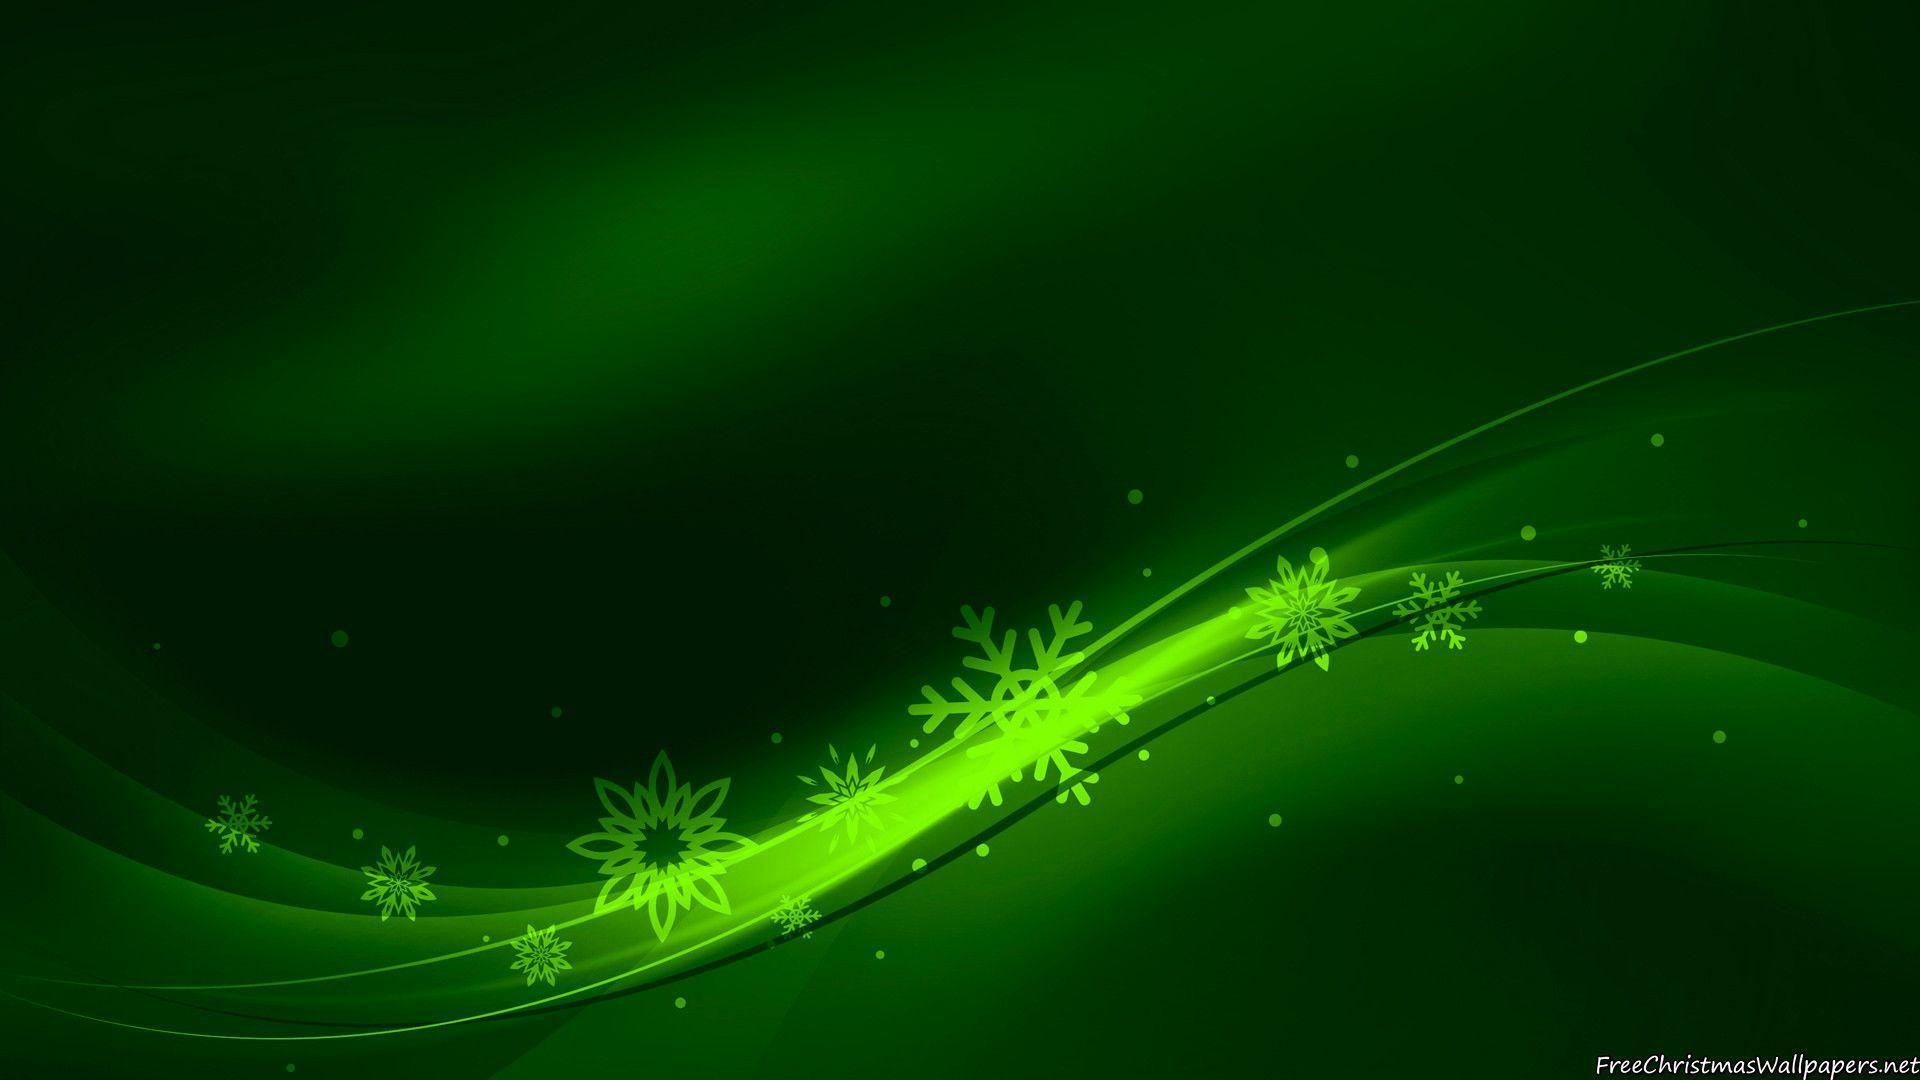 green christmas wallpaper - photo #22